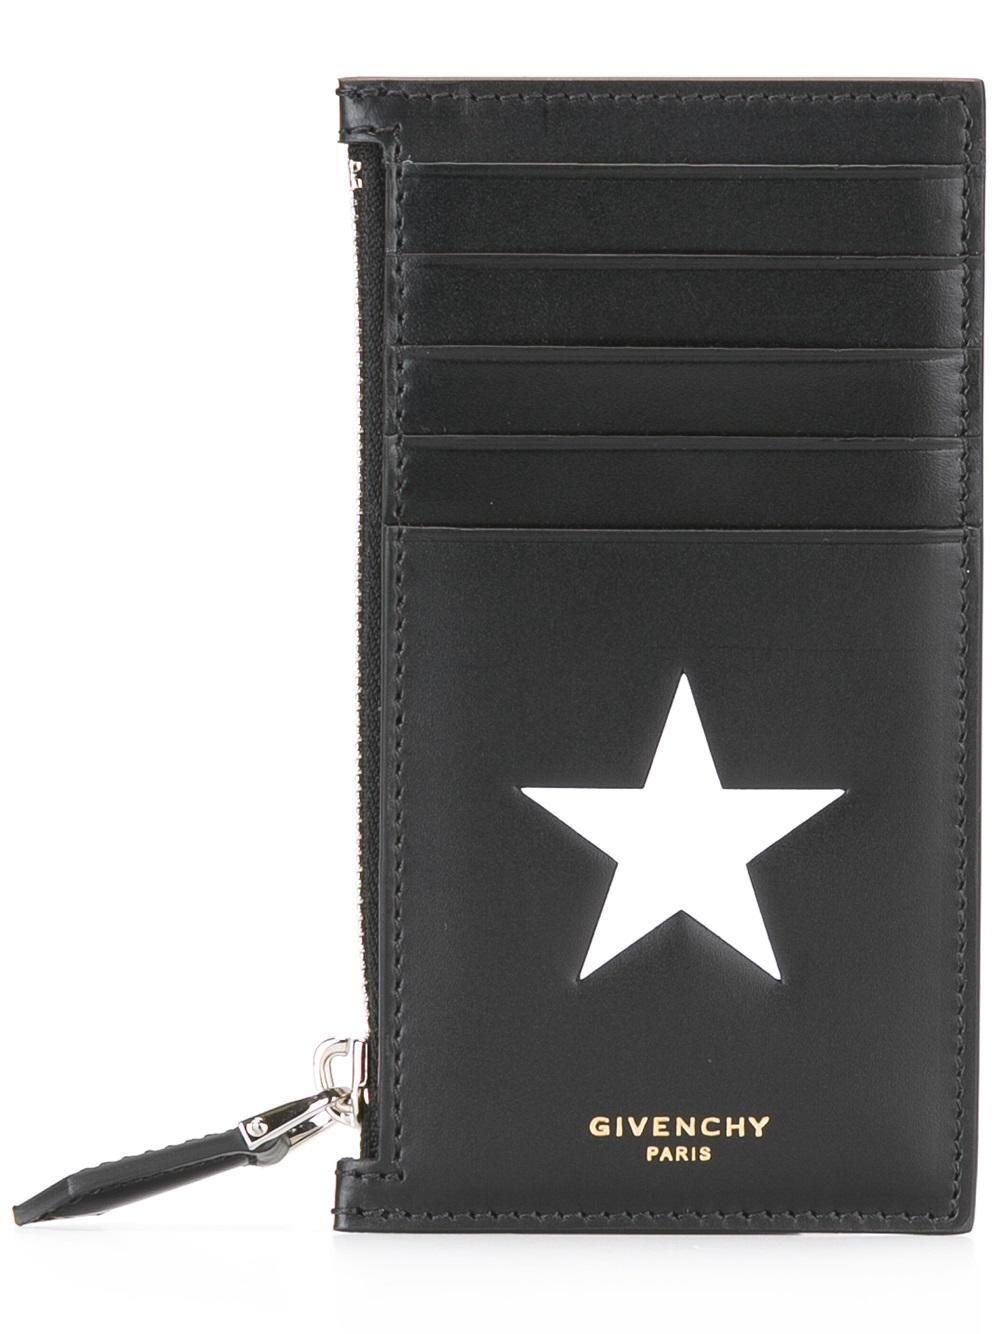 Givenchy Porte-cartes en cuir texturé yYnR7YZykH